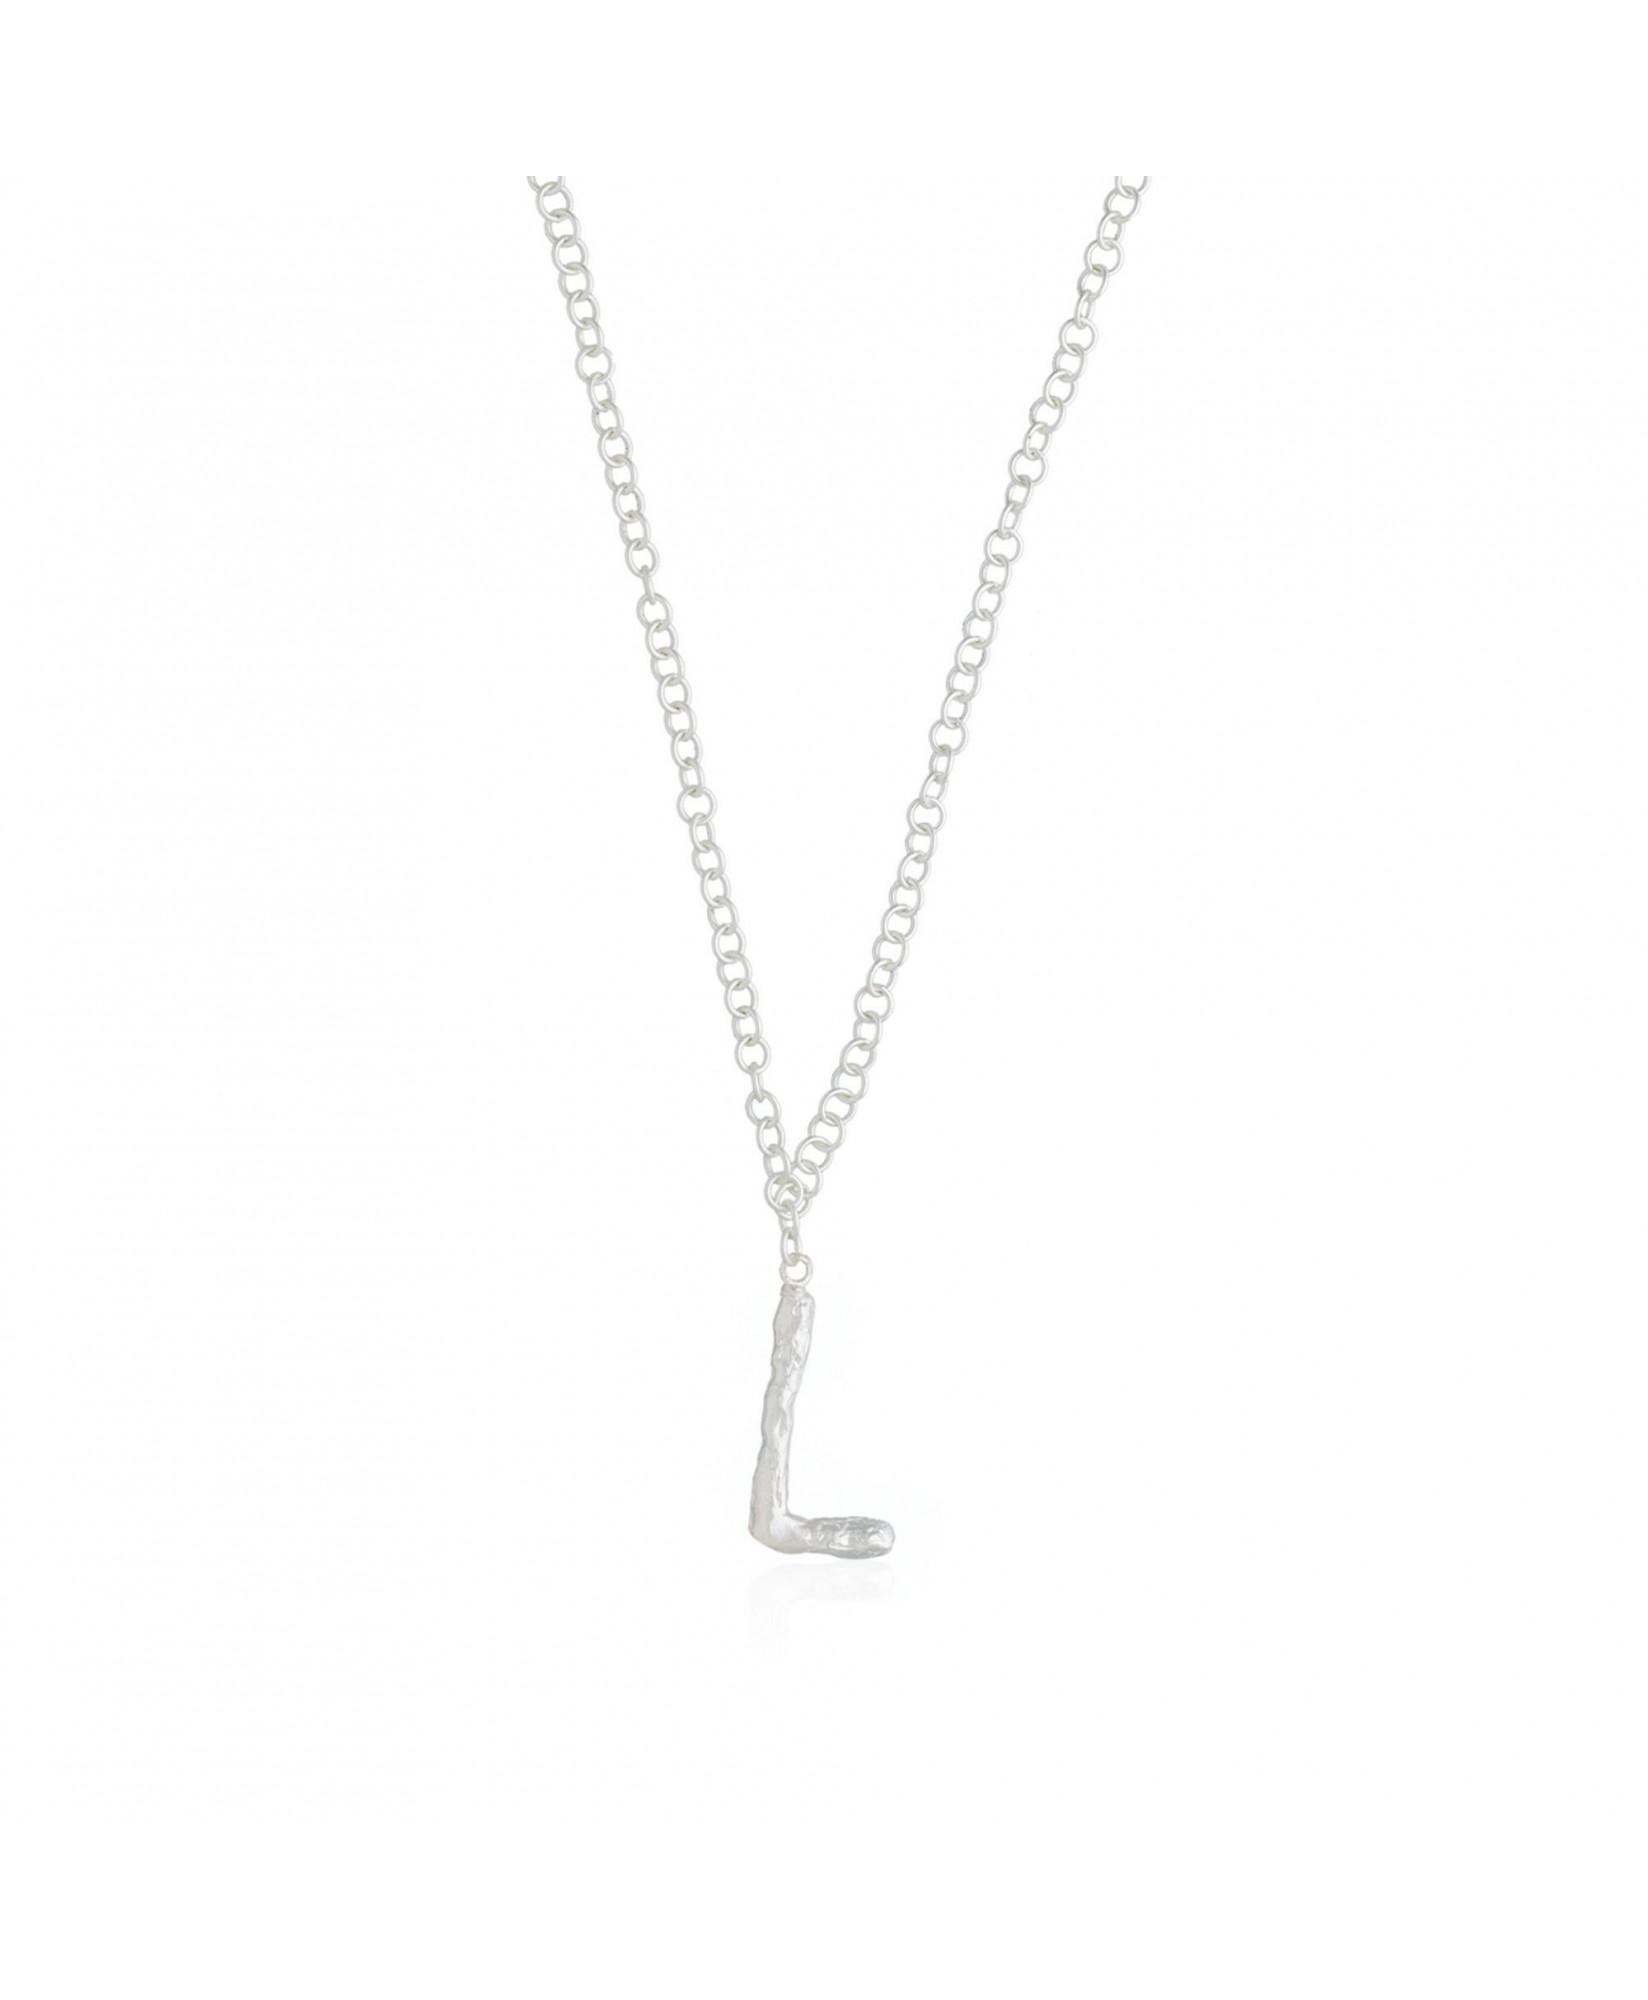 Collar colgante inicial plata L Collar colgante inicial plata L